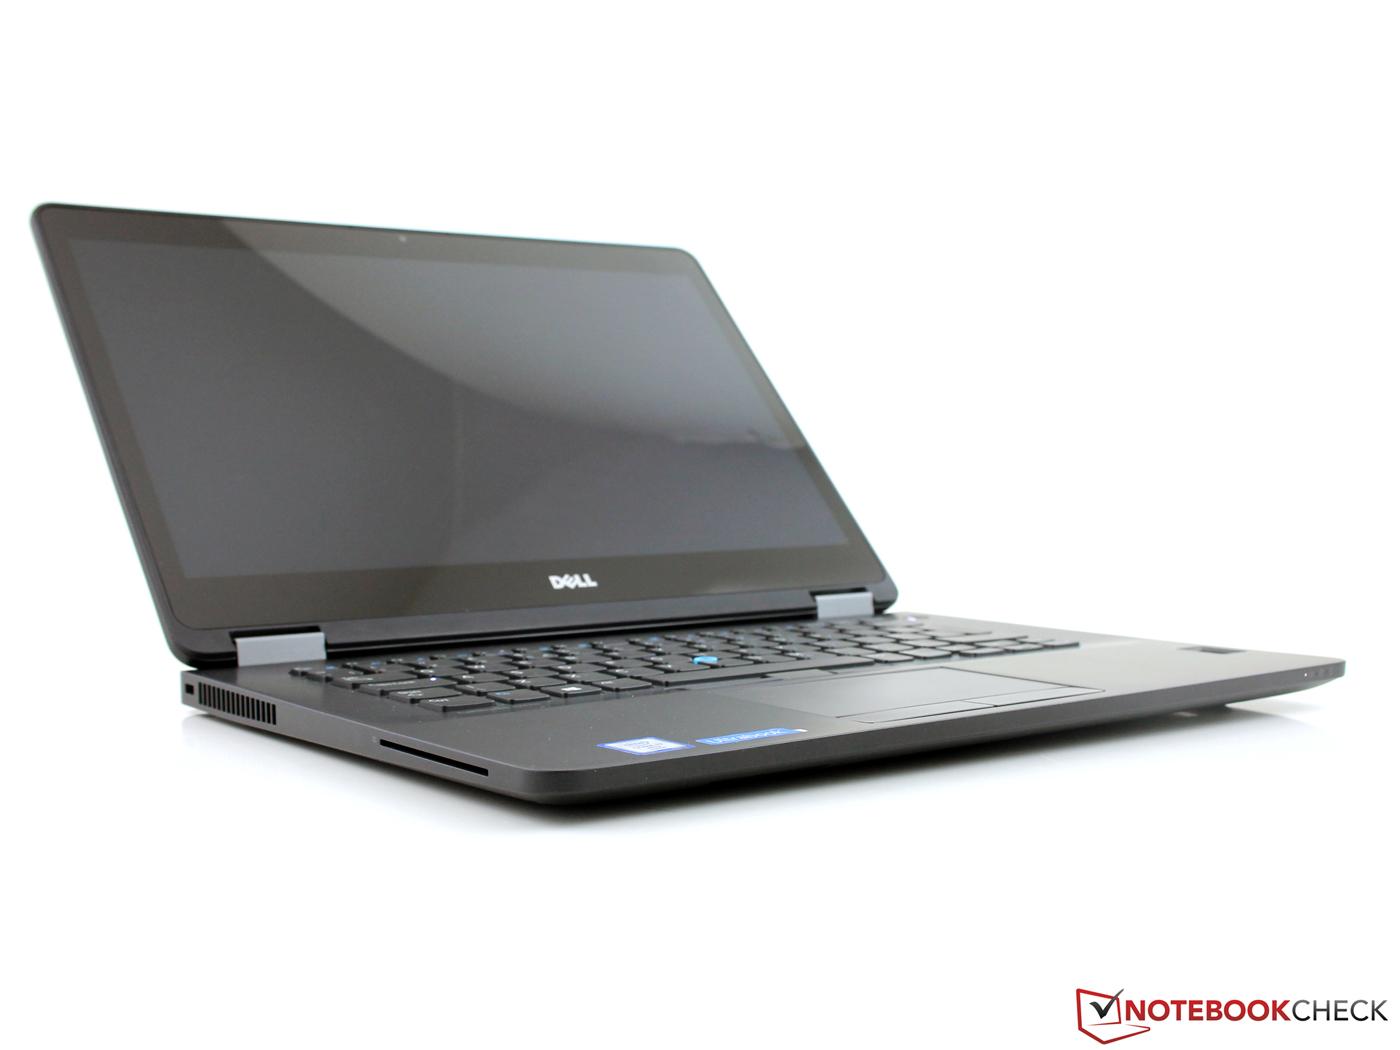 Dell Latitude 14 E7470 Ultrabook Review - NotebookCheck net